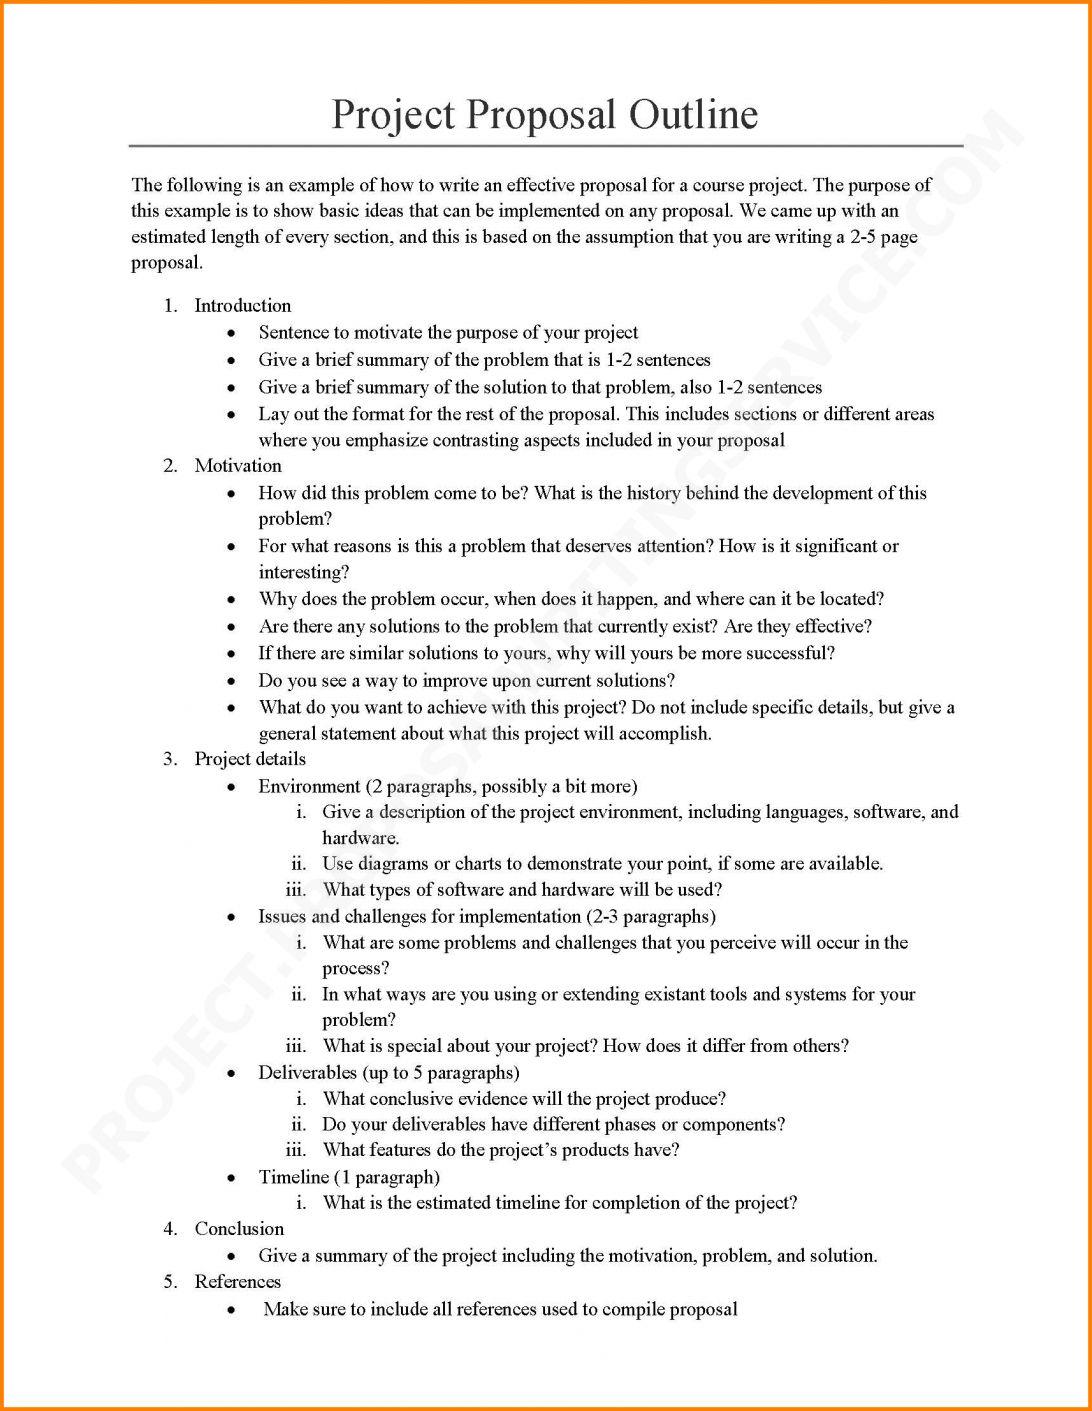 Non Profit Proposal Template Stcharleschill Template In 2021 Proposal Templates Business Proposal Template Grant Proposal